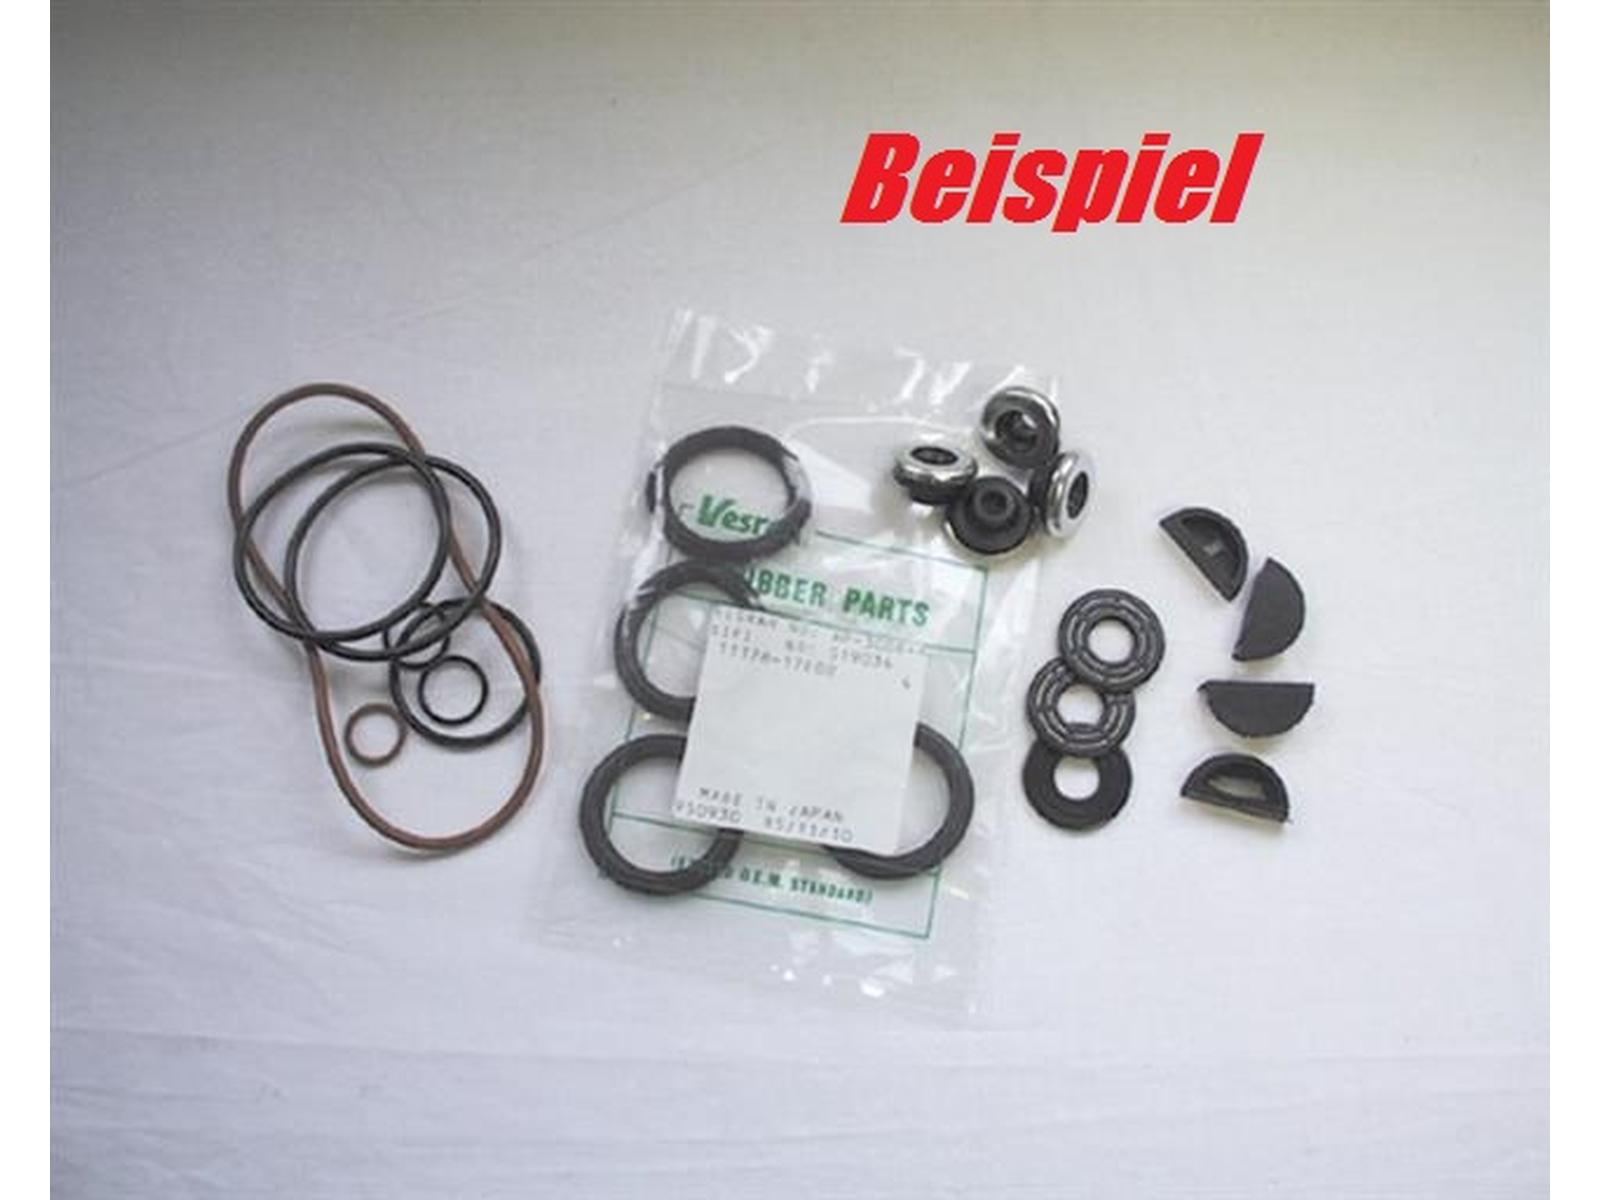 Ventildeckeldichtung Kawasaki Z 650 B/F1